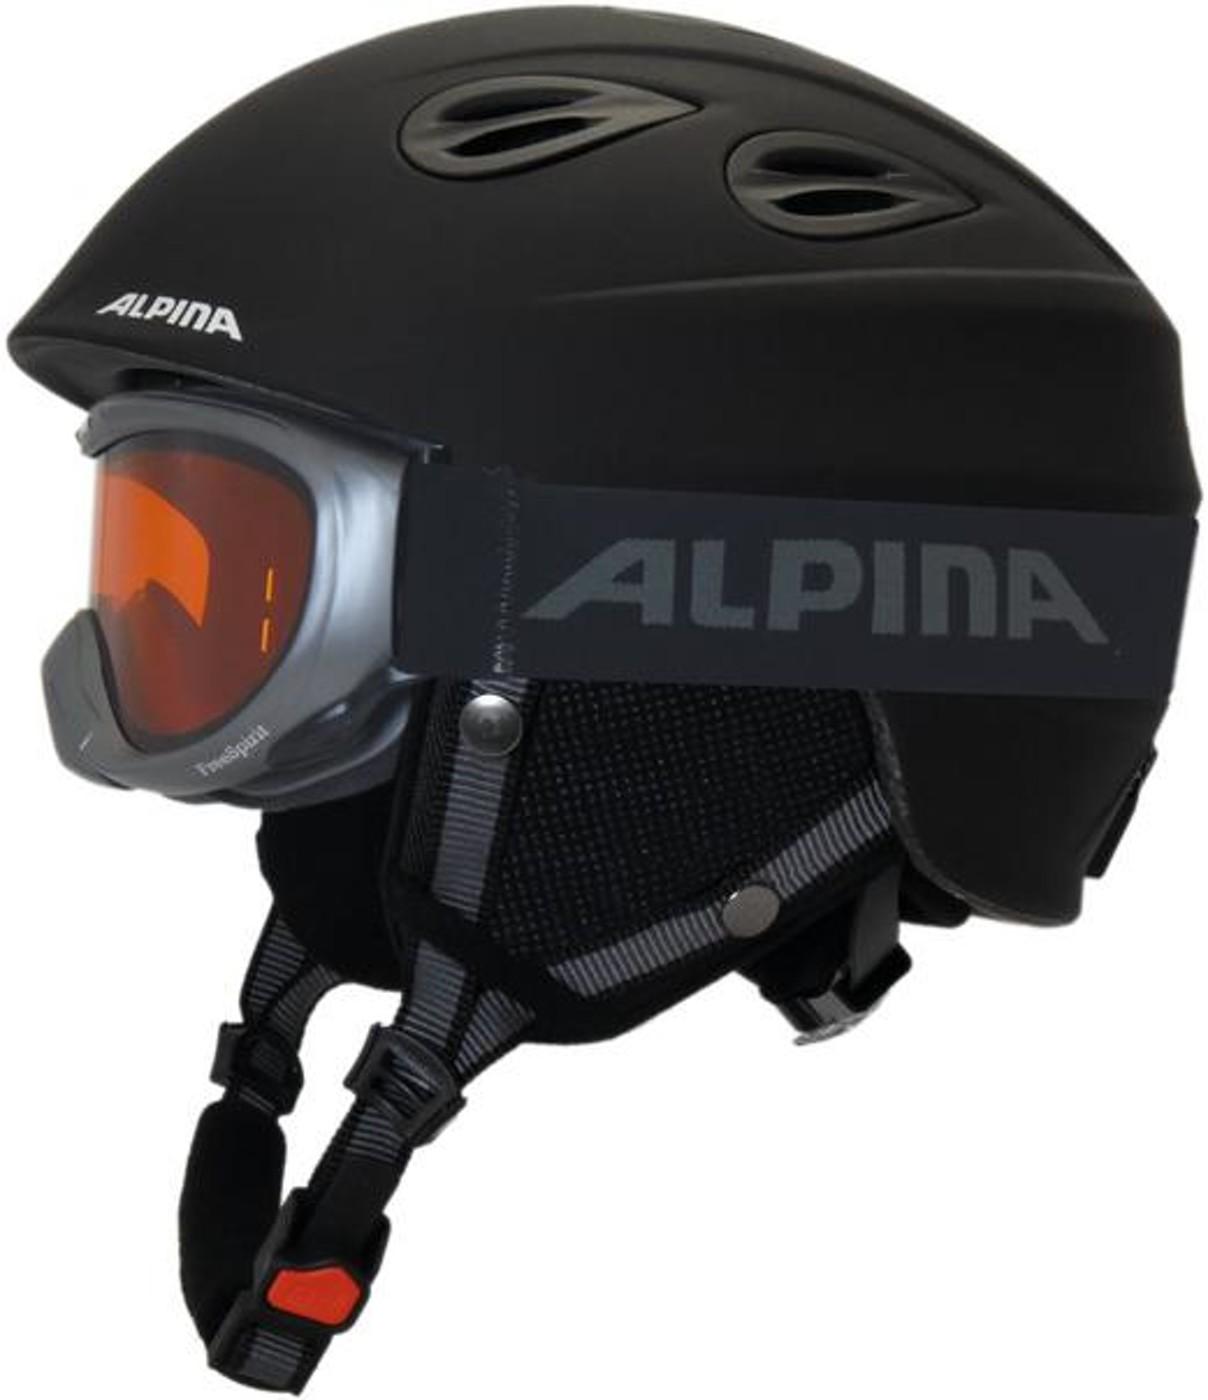 ALPINA Junta 2.0 Set black m. 57-61 (Freesp)